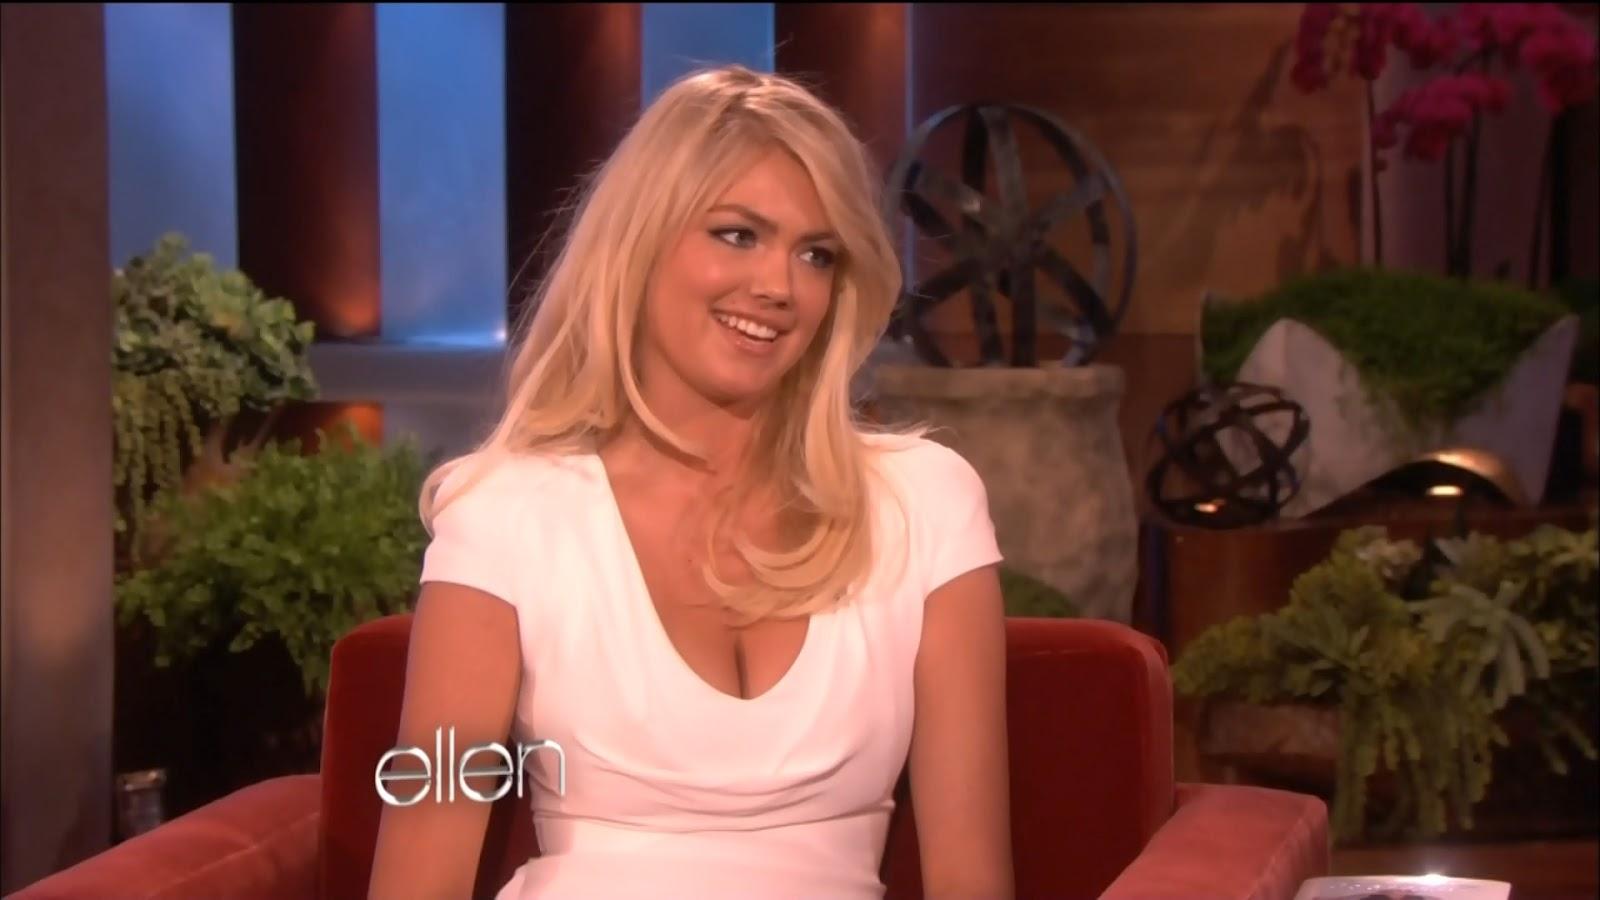 http://4.bp.blogspot.com/-DYo3Q3xR-is/T3sXUtESlSI/AAAAAAAAA0o/WkBODduEDlY/s1600/Kate_Upton_-_Ellen_DeGeneres_2012_02_16.ts.Standbild008.jpg